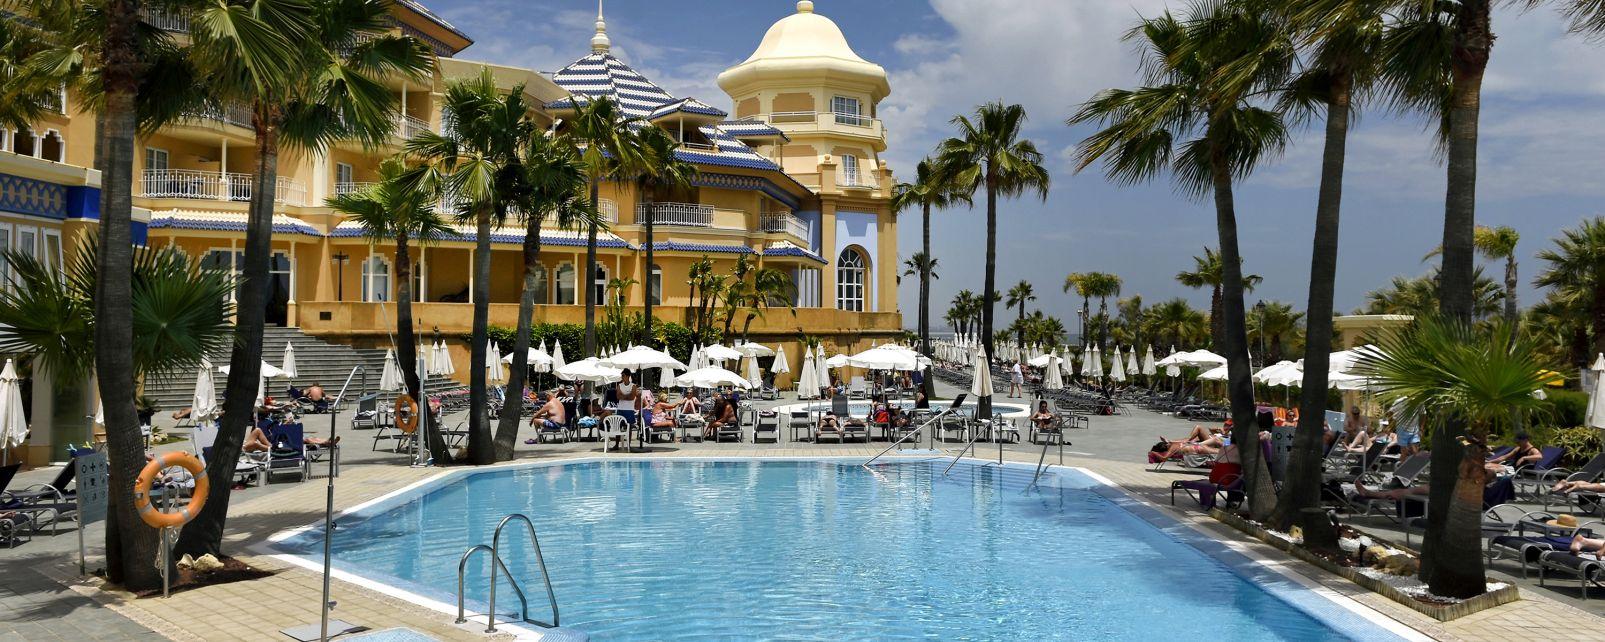 Hôtel Meliá Atlantico